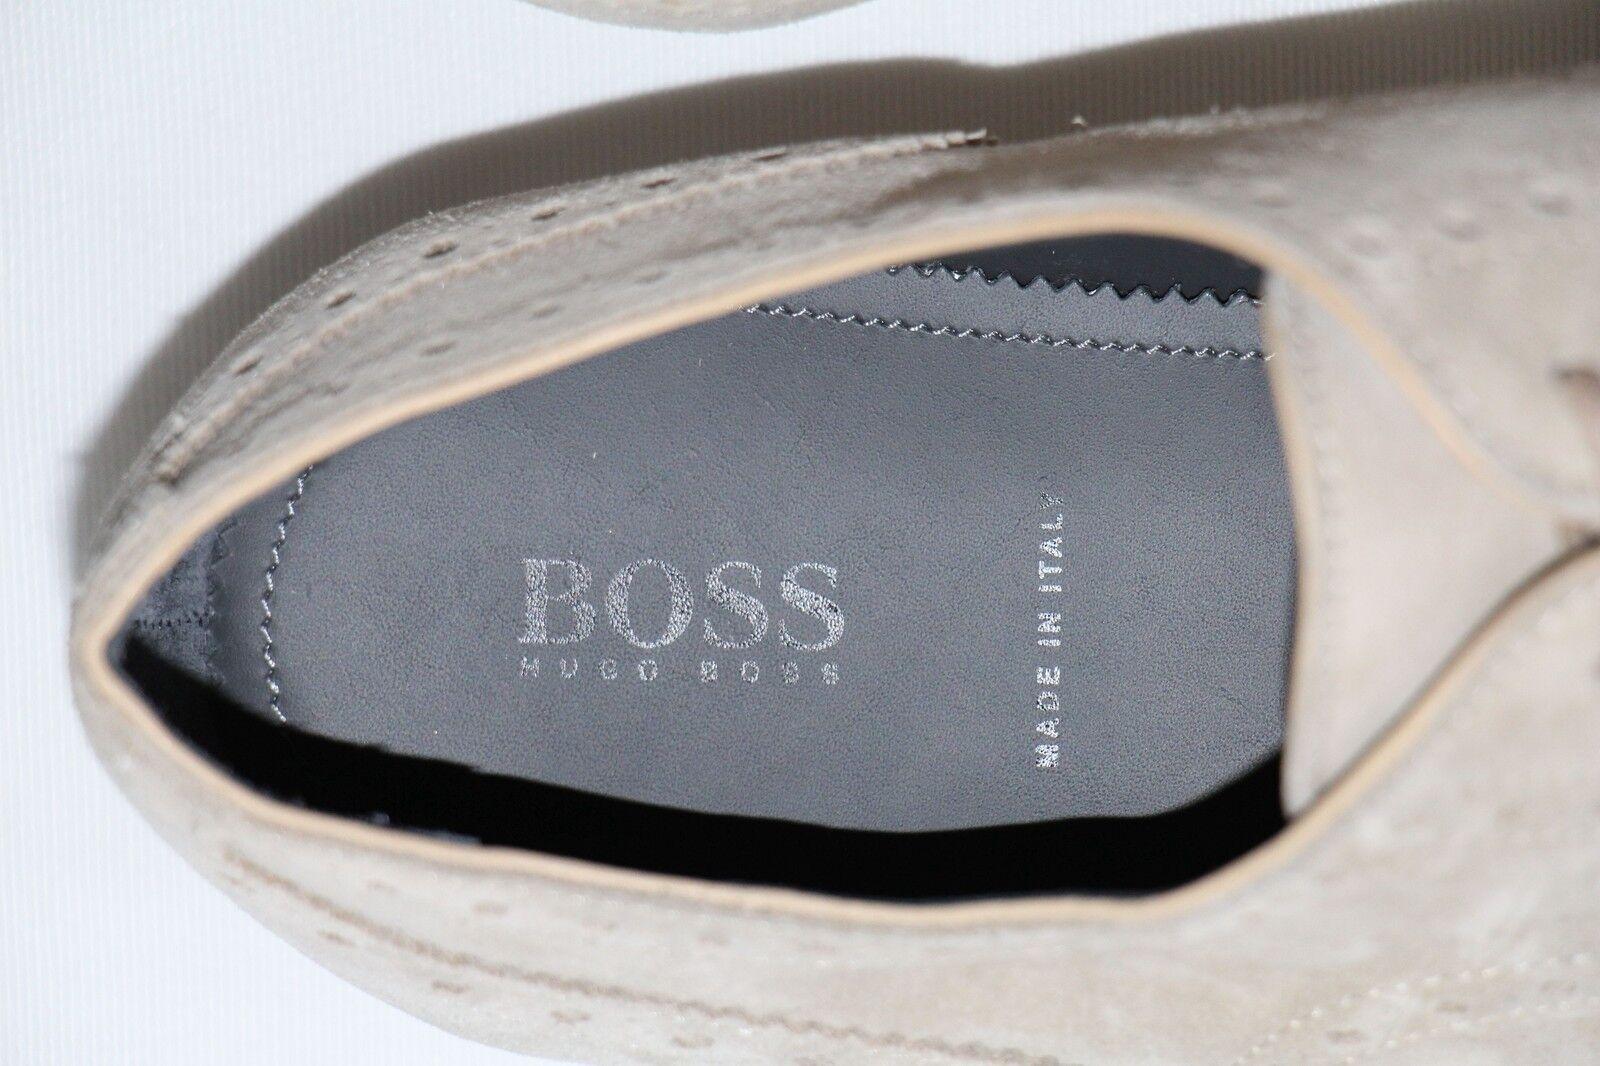 HUGO BOSS UK BUSINESSSCHUHE, Mod. Deeder-SD, Gr. 42   UK BOSS 8   US 9 26dcaf